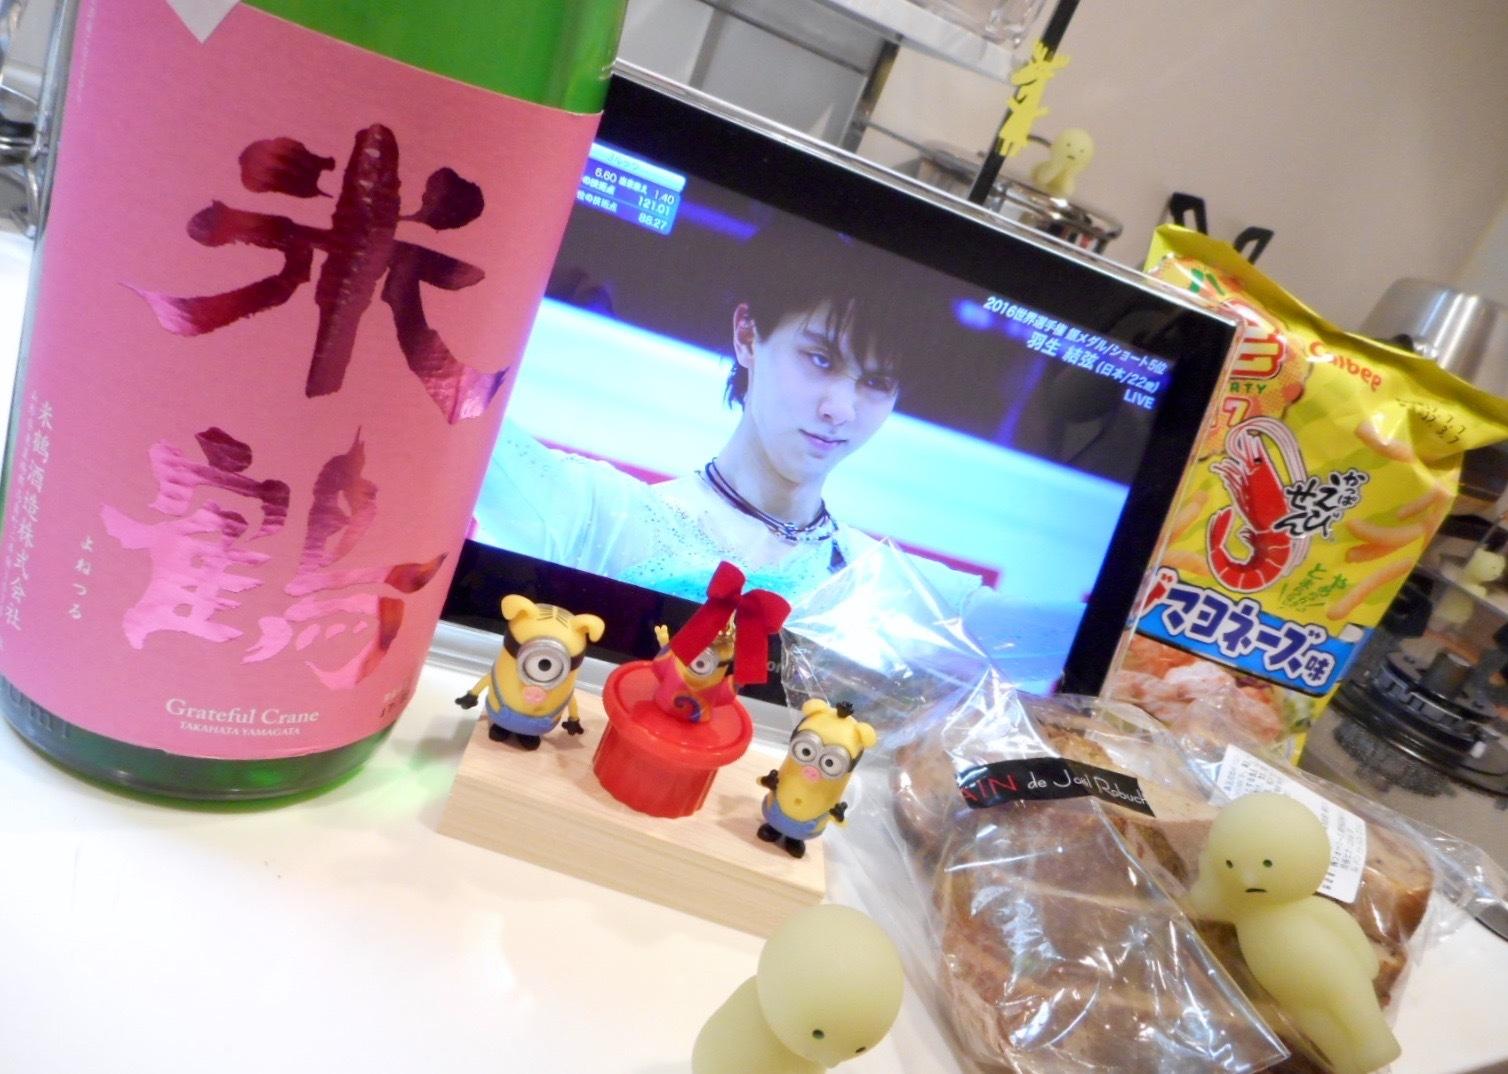 yonetsuru_jungin_shiboritate28by1.jpg